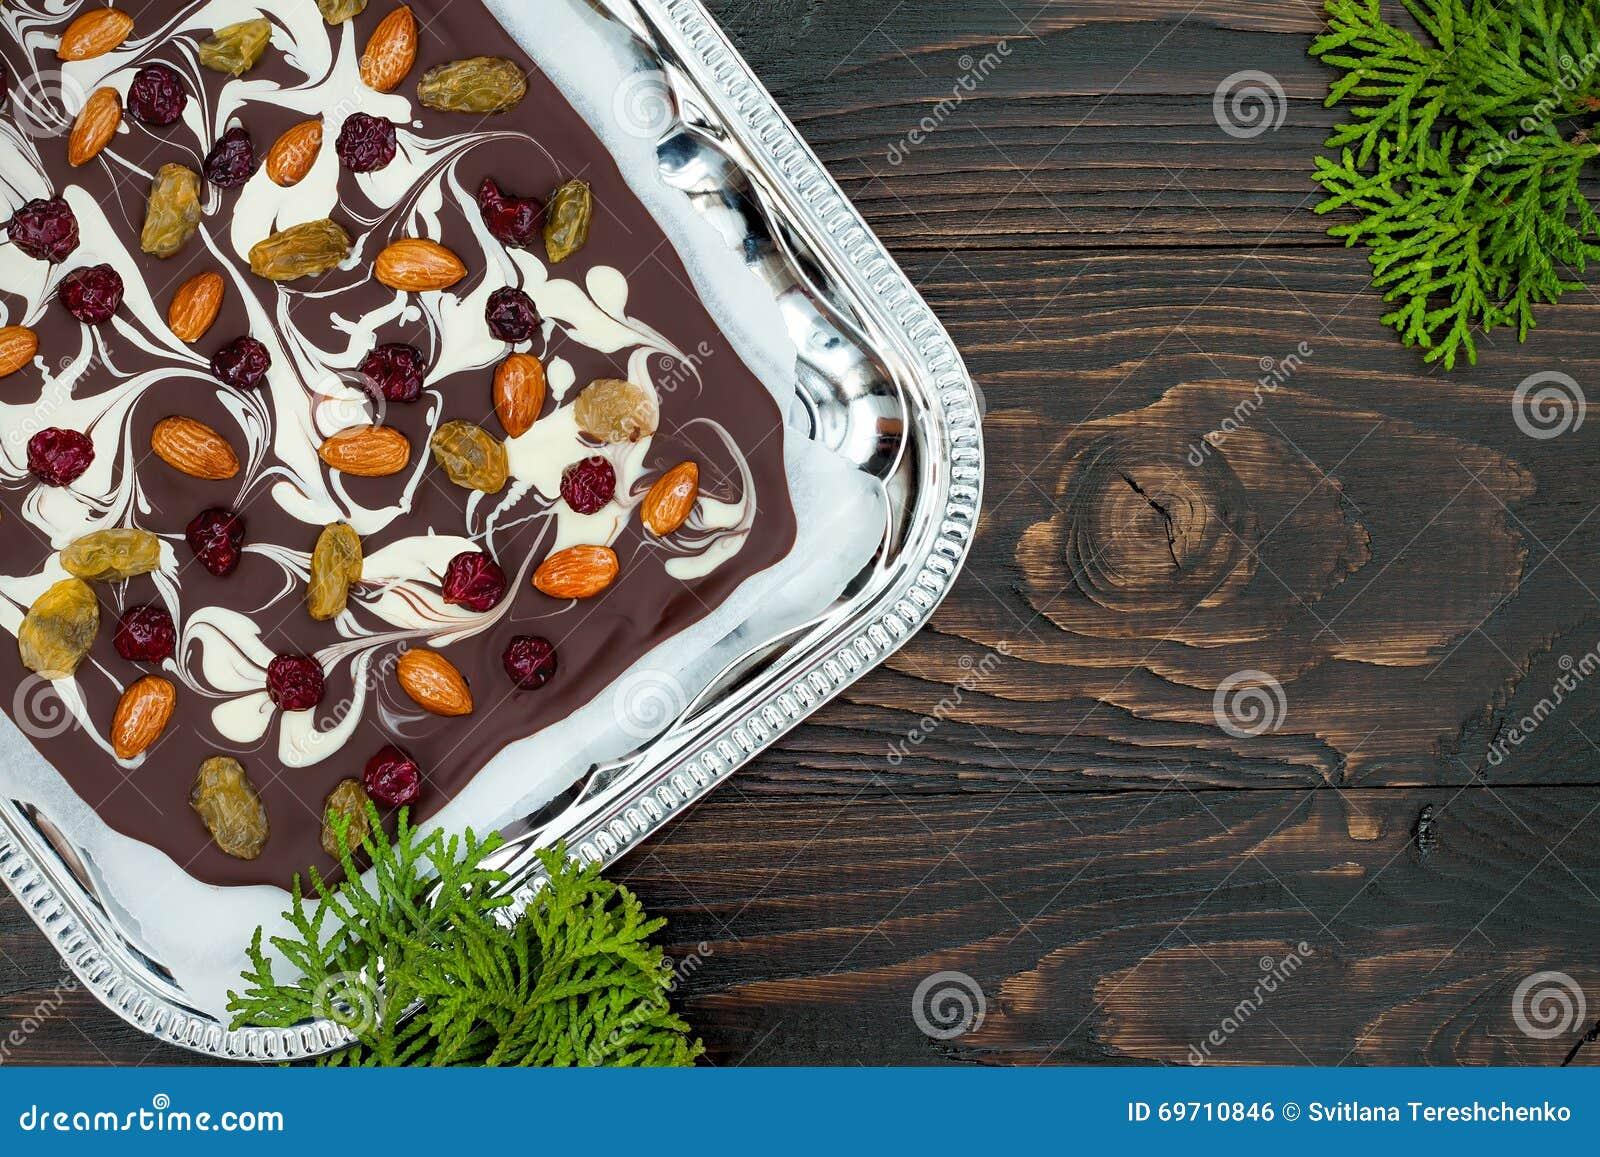 Recipe Dessert Nuts Dried Fruits Chocolate